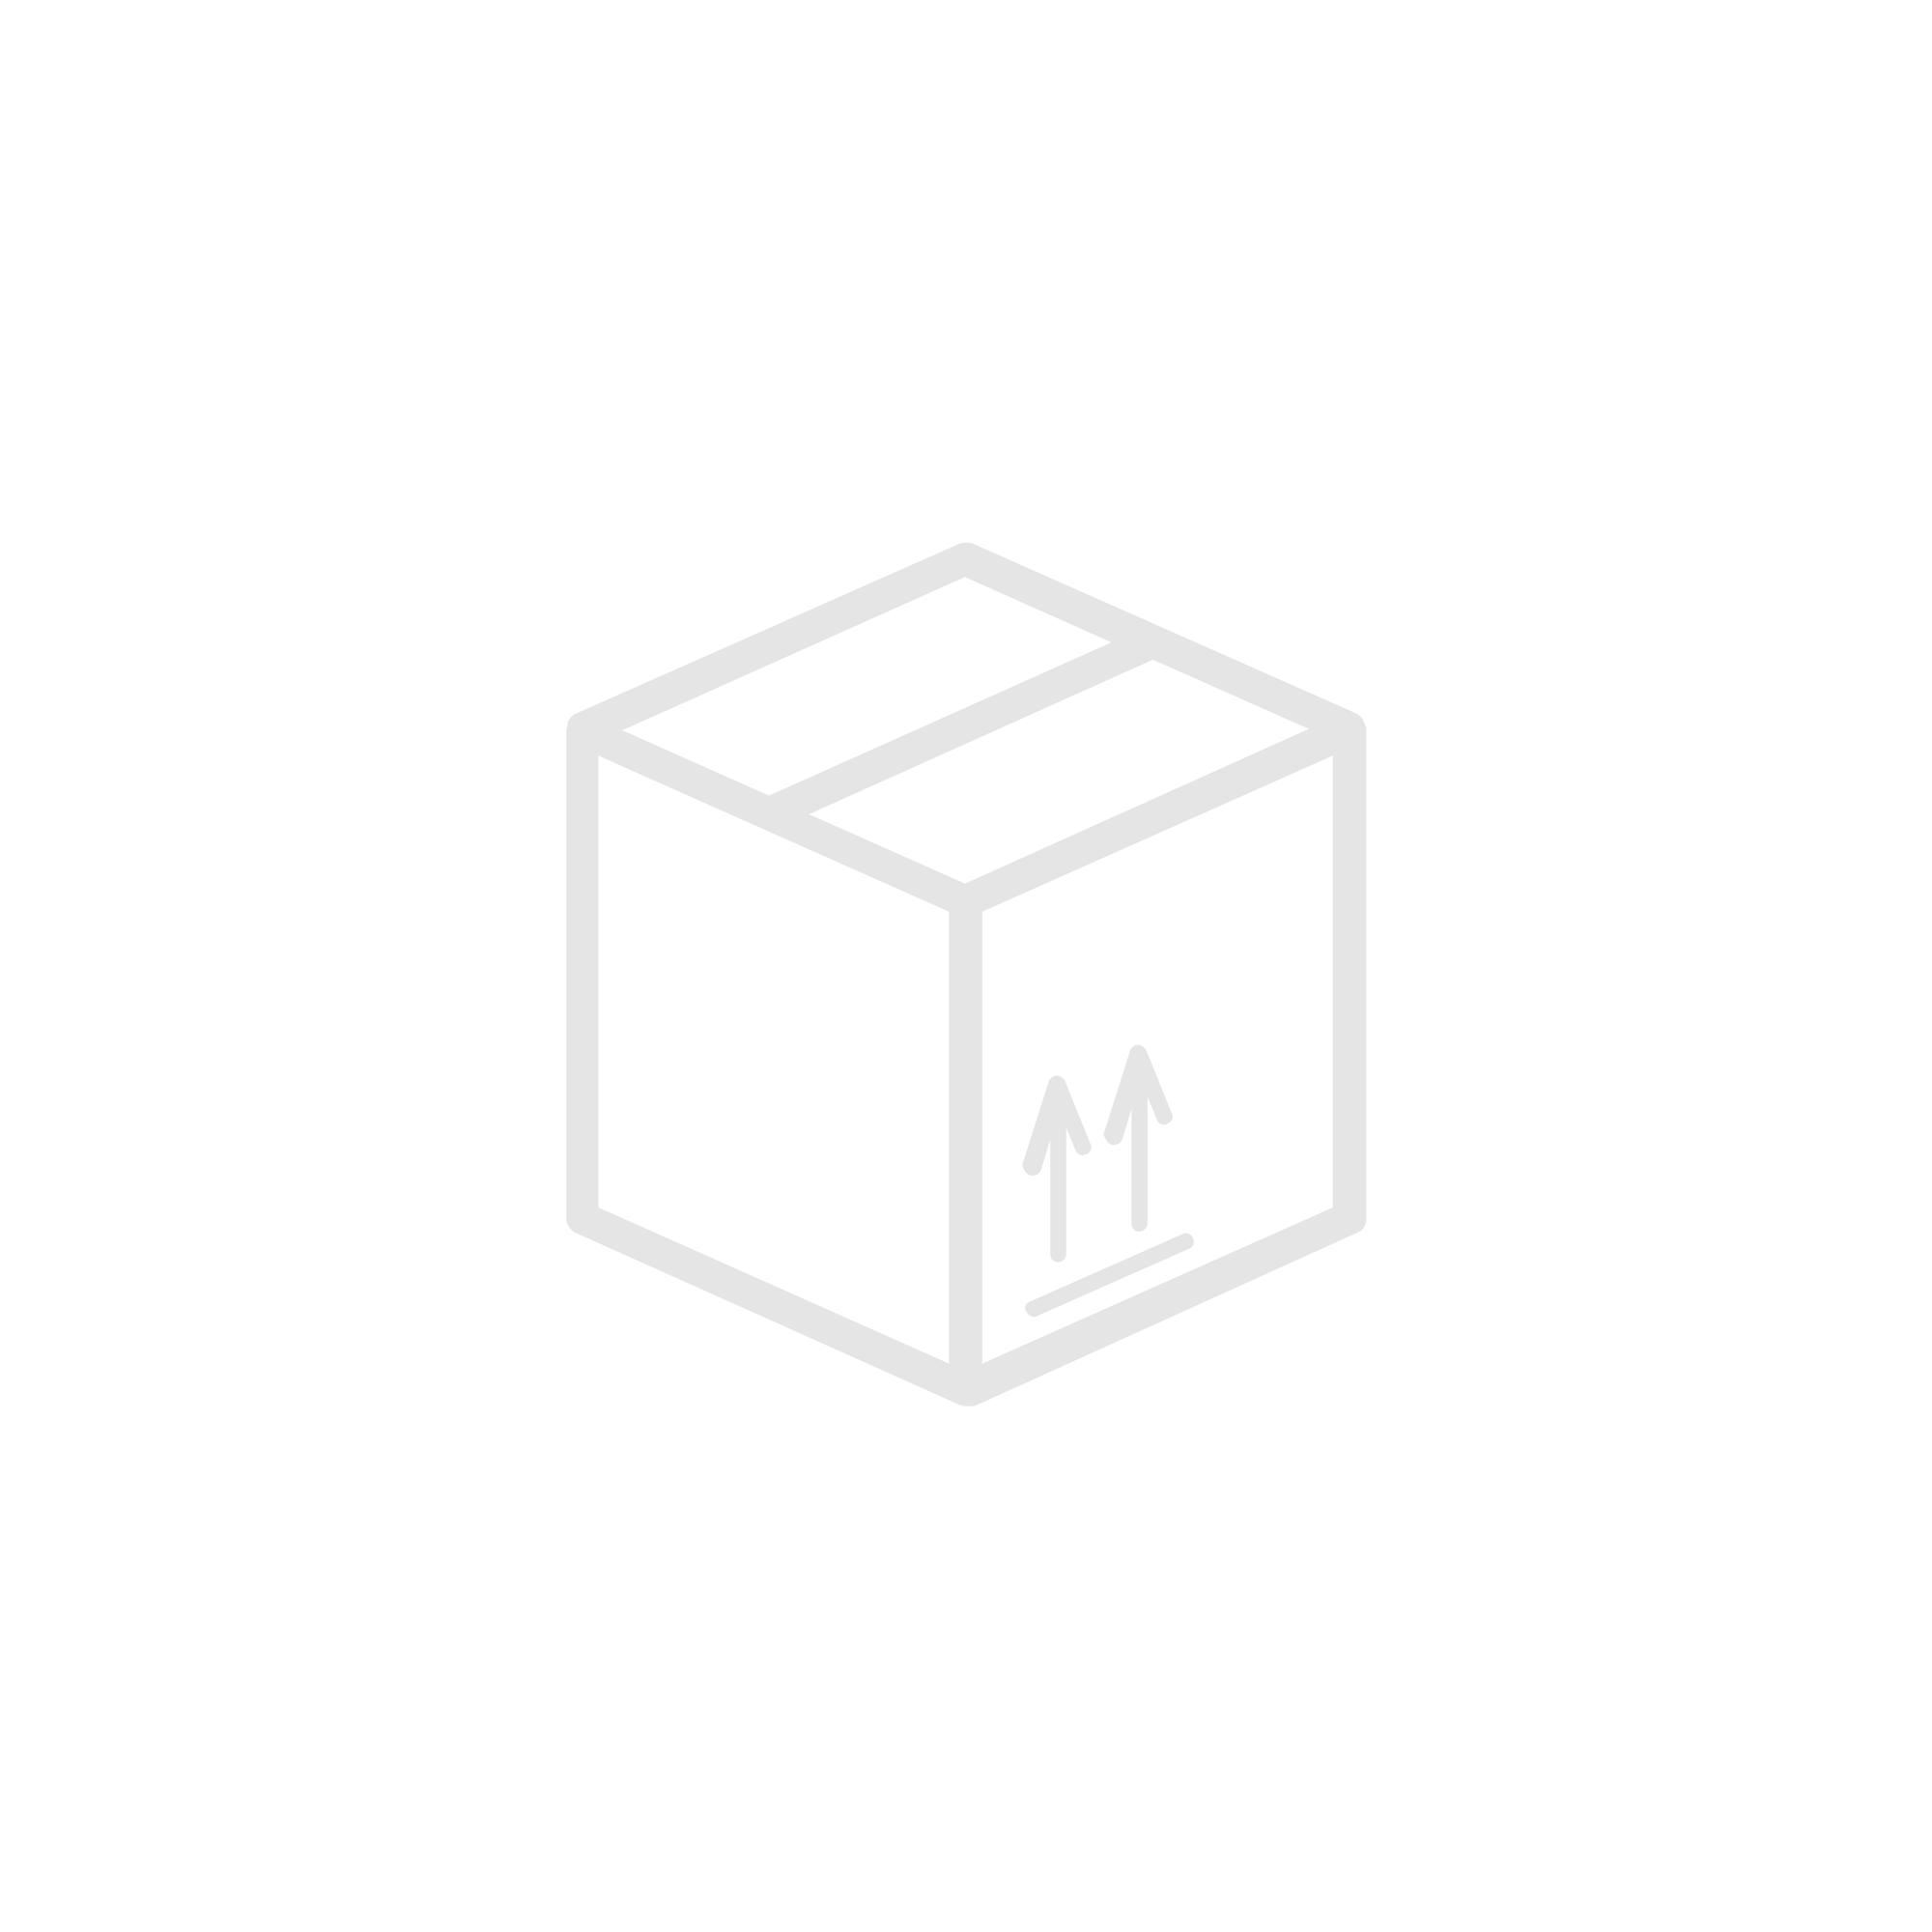 SCAME Krabice SCABOX 120x80x50mm+vývodky IP55